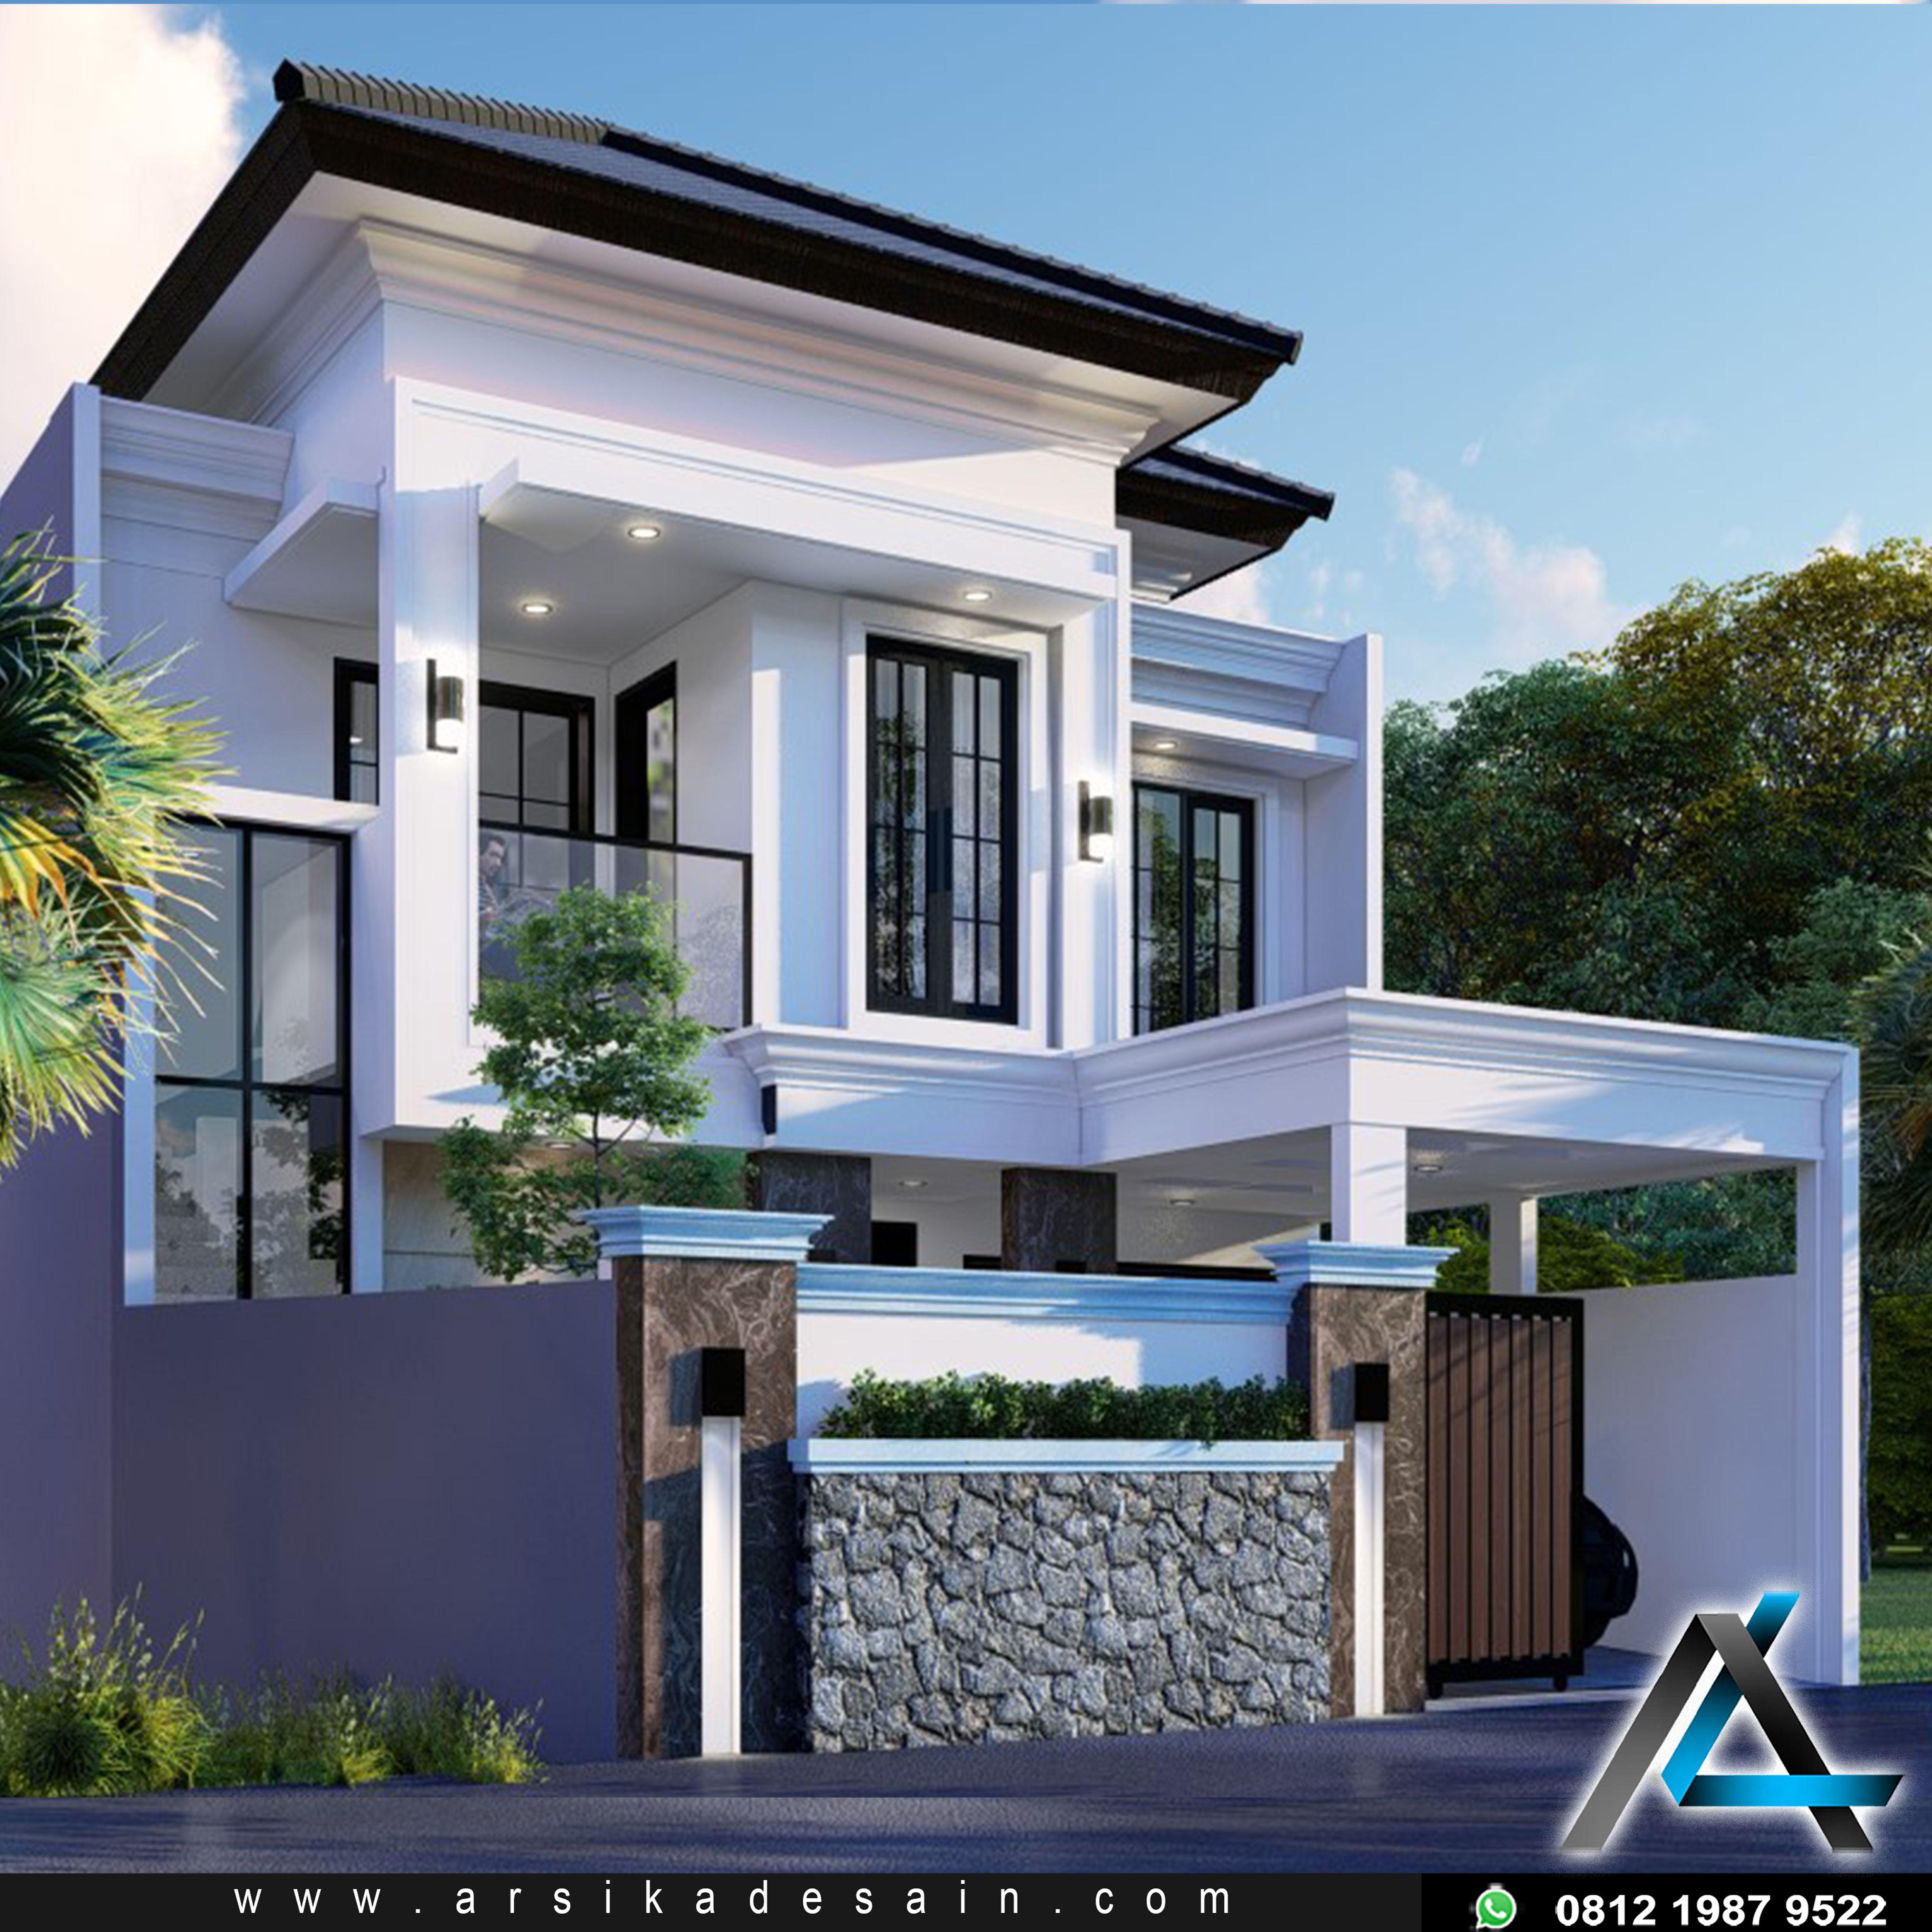 Desain Rumah Klasik Modern Arsitektur Arsitektur Modern Rumah Indah